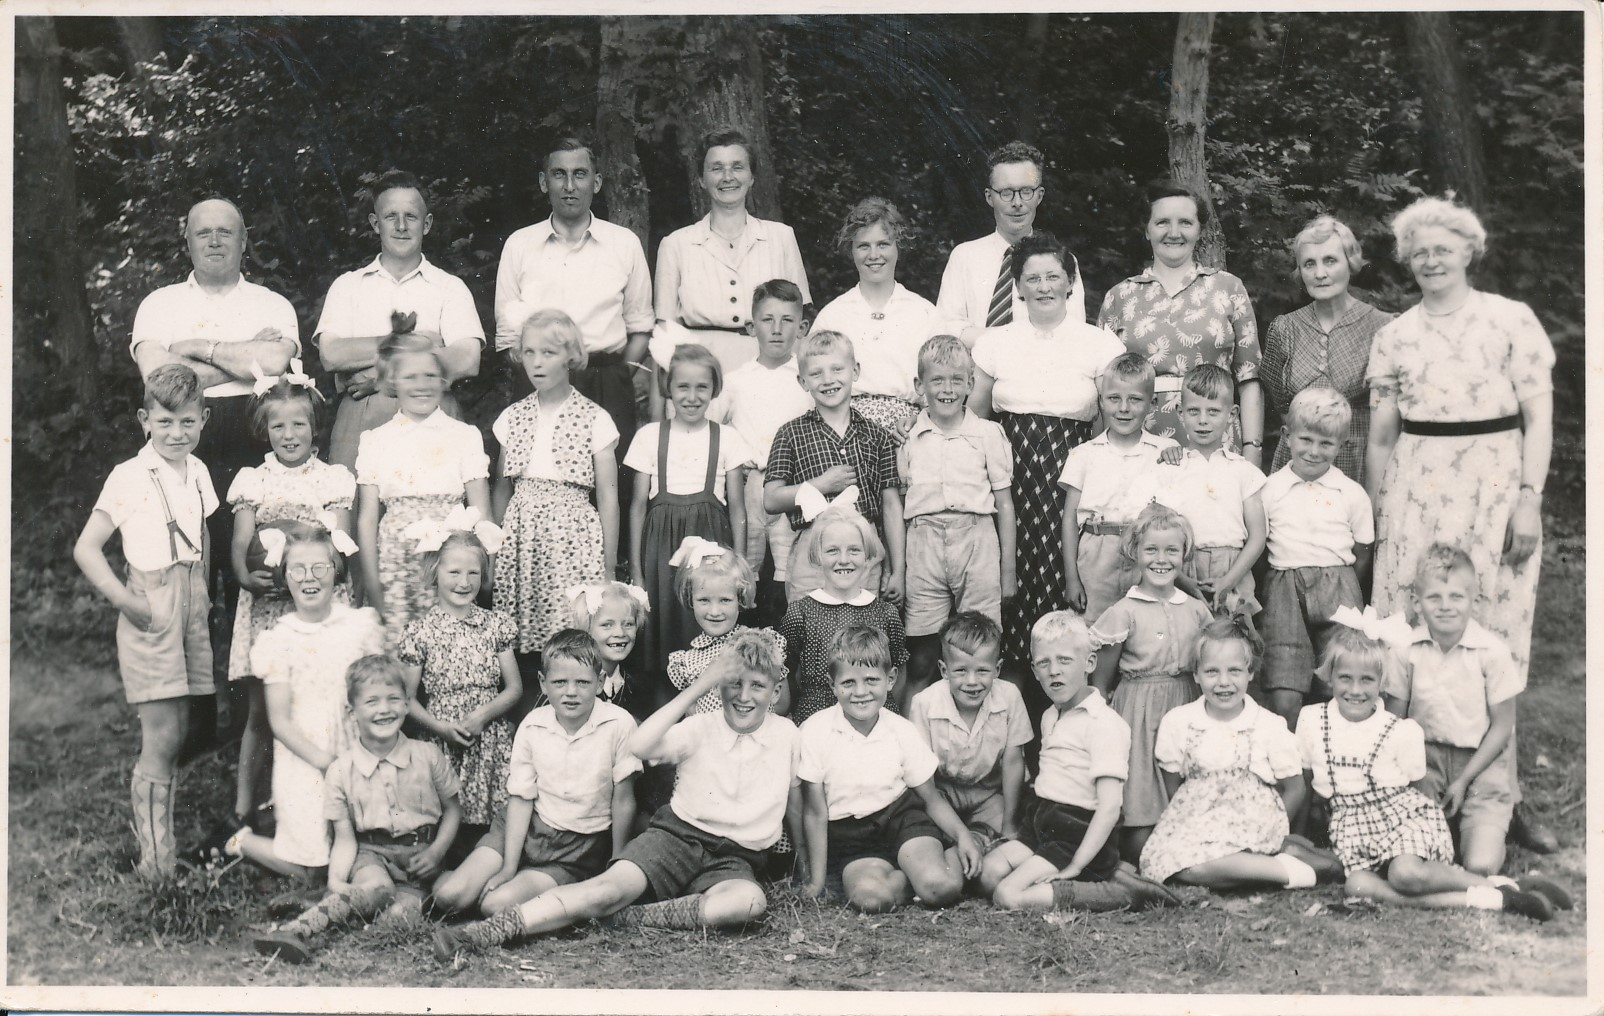 Fotoalbum Eddie Groen, 015, Skoalfoto, u.o. Yde Terpstra, juffer Sibbeltsje, master van Manen,1952